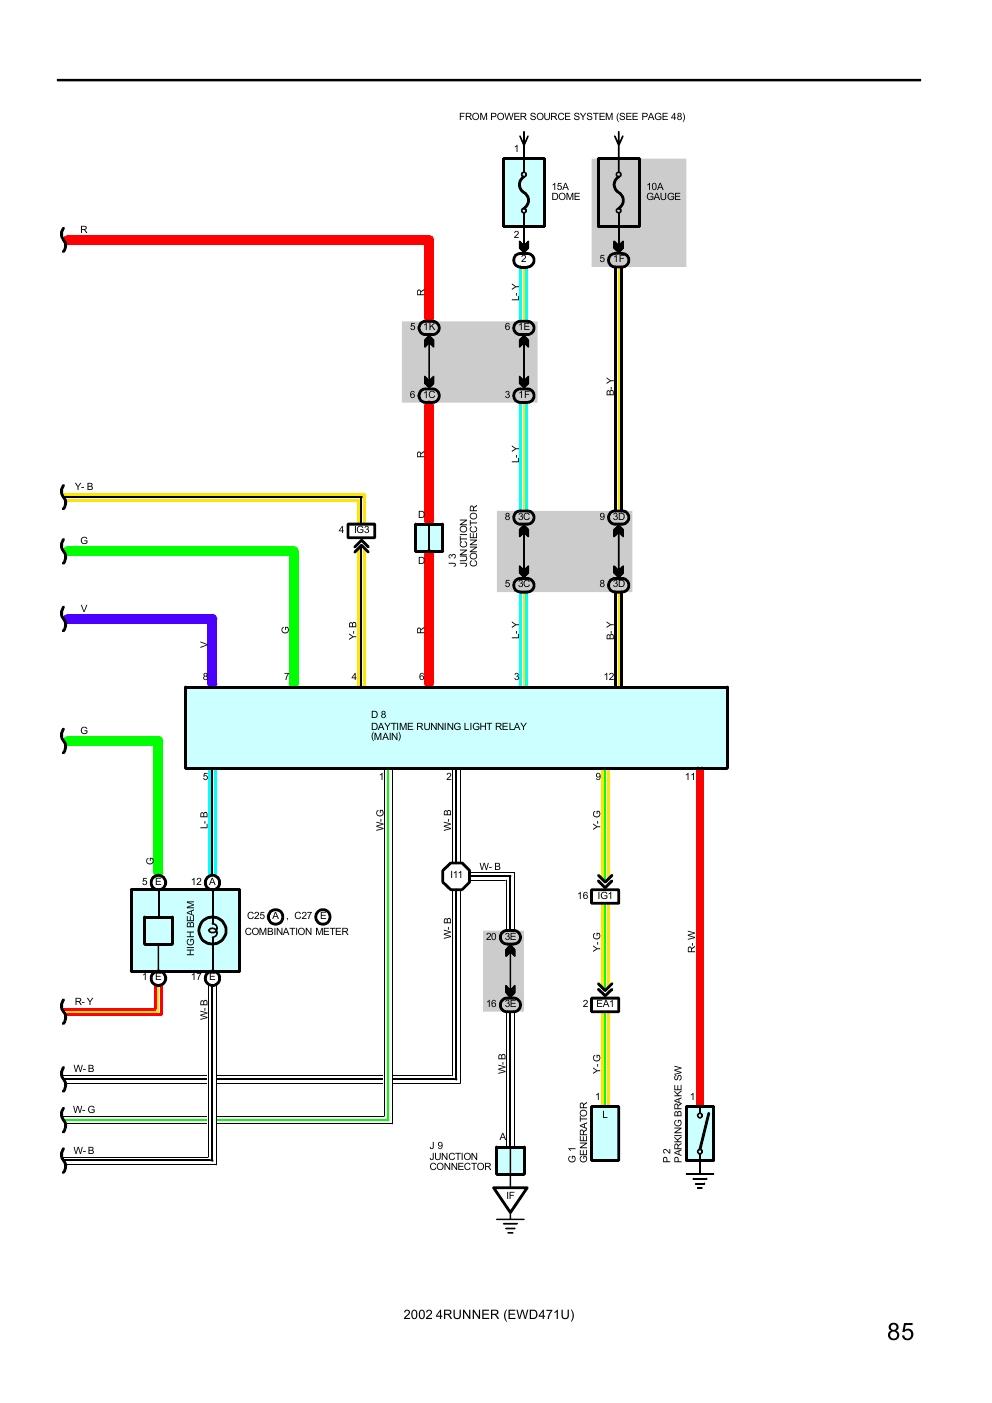 hight resolution of 2000 toyota headlight diagram schema diagram database toyota yaris headlight wiring diagram toyota 4runner headlight wiring